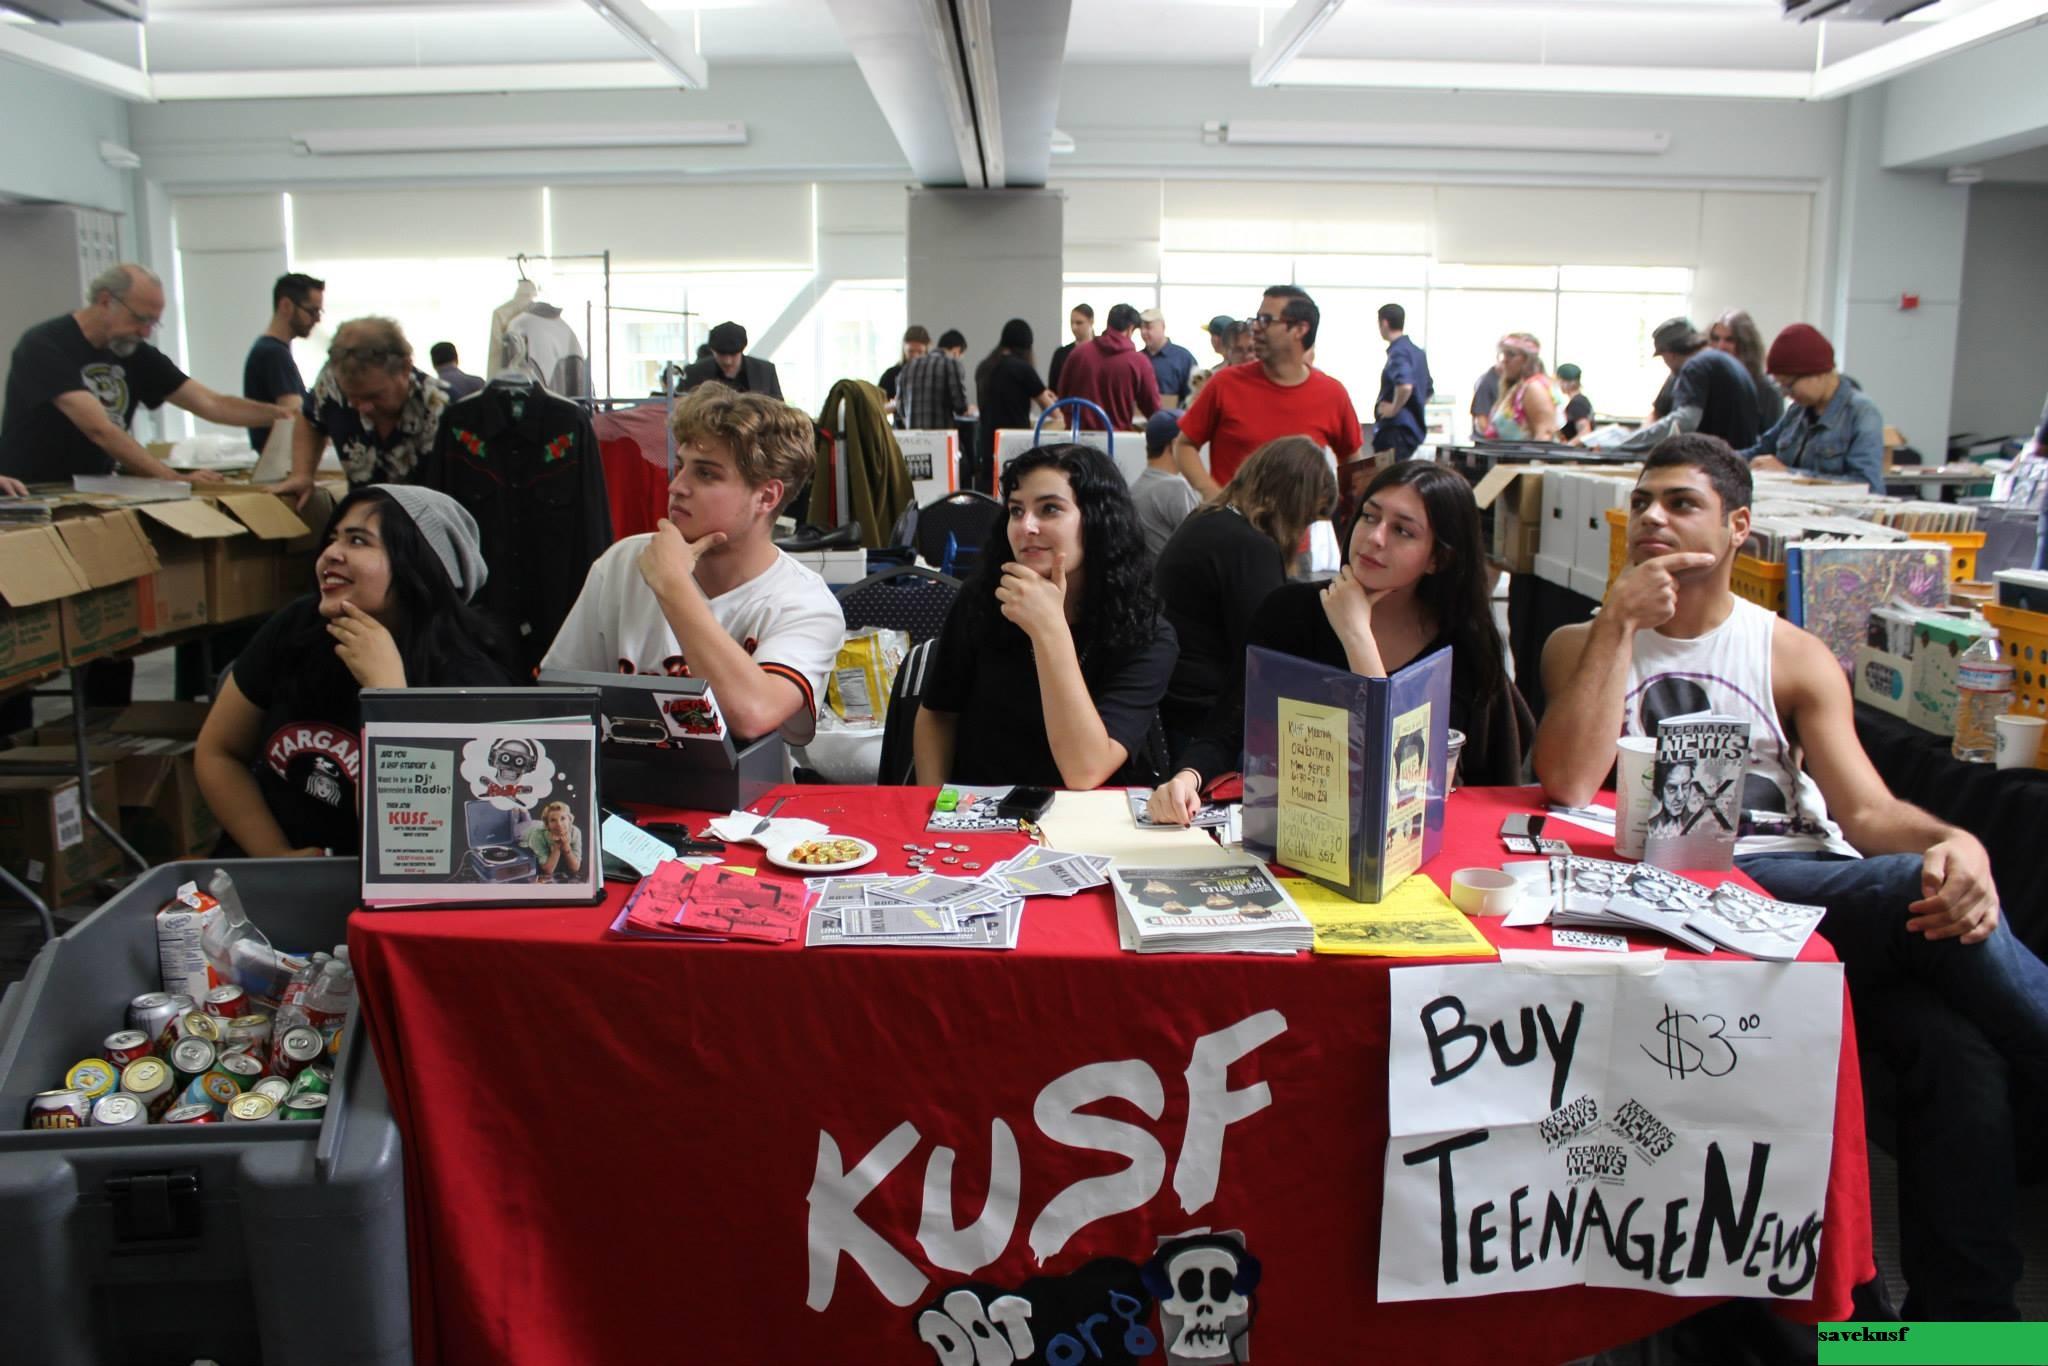 Denda $50,000 Menyelesaikan Transfer KUSF di San Francisco